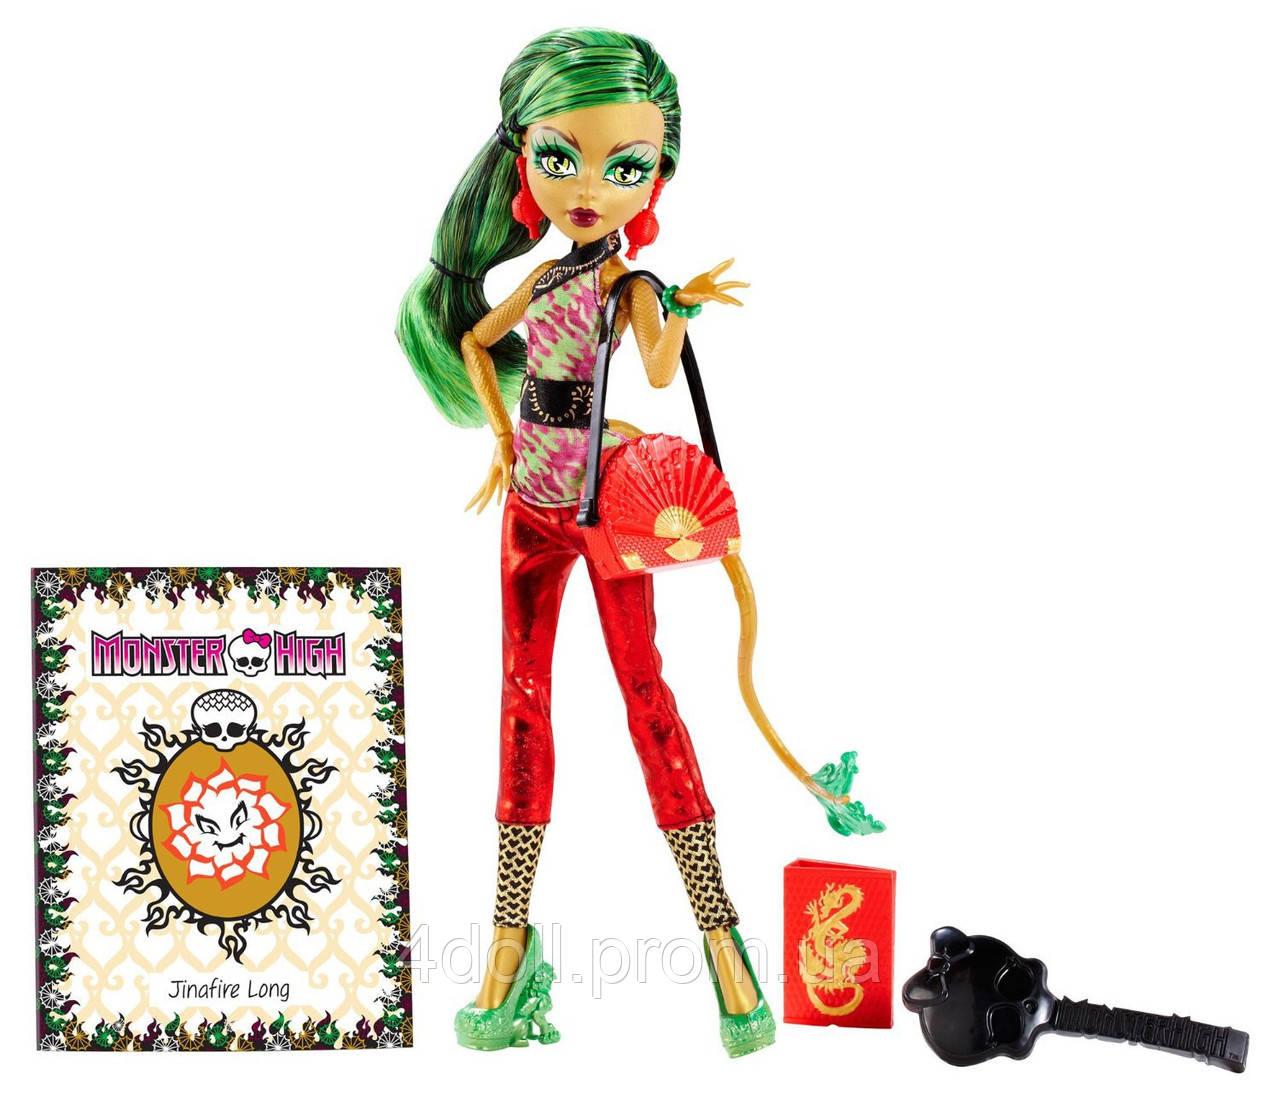 фото куклы монстер хай дженифер лонг